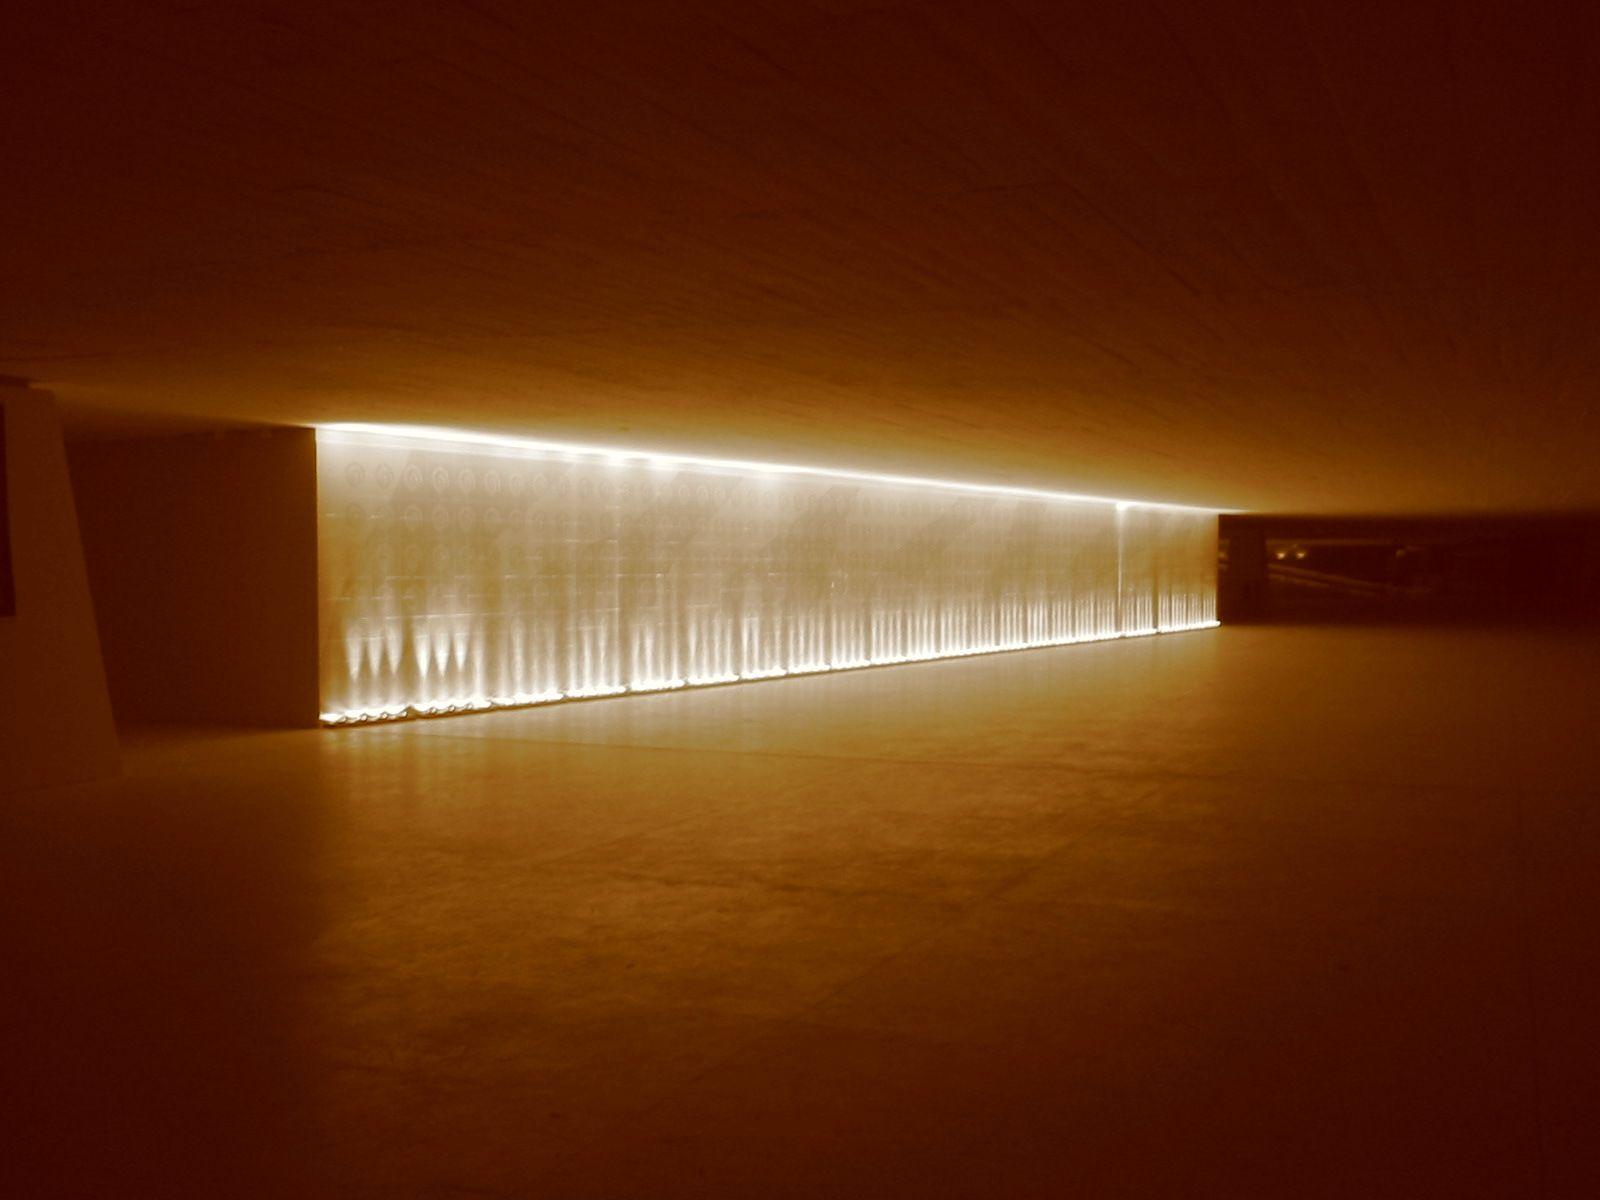 Museu_Oscar_Niemeyer,_interior_01.jpg (1600×1200)